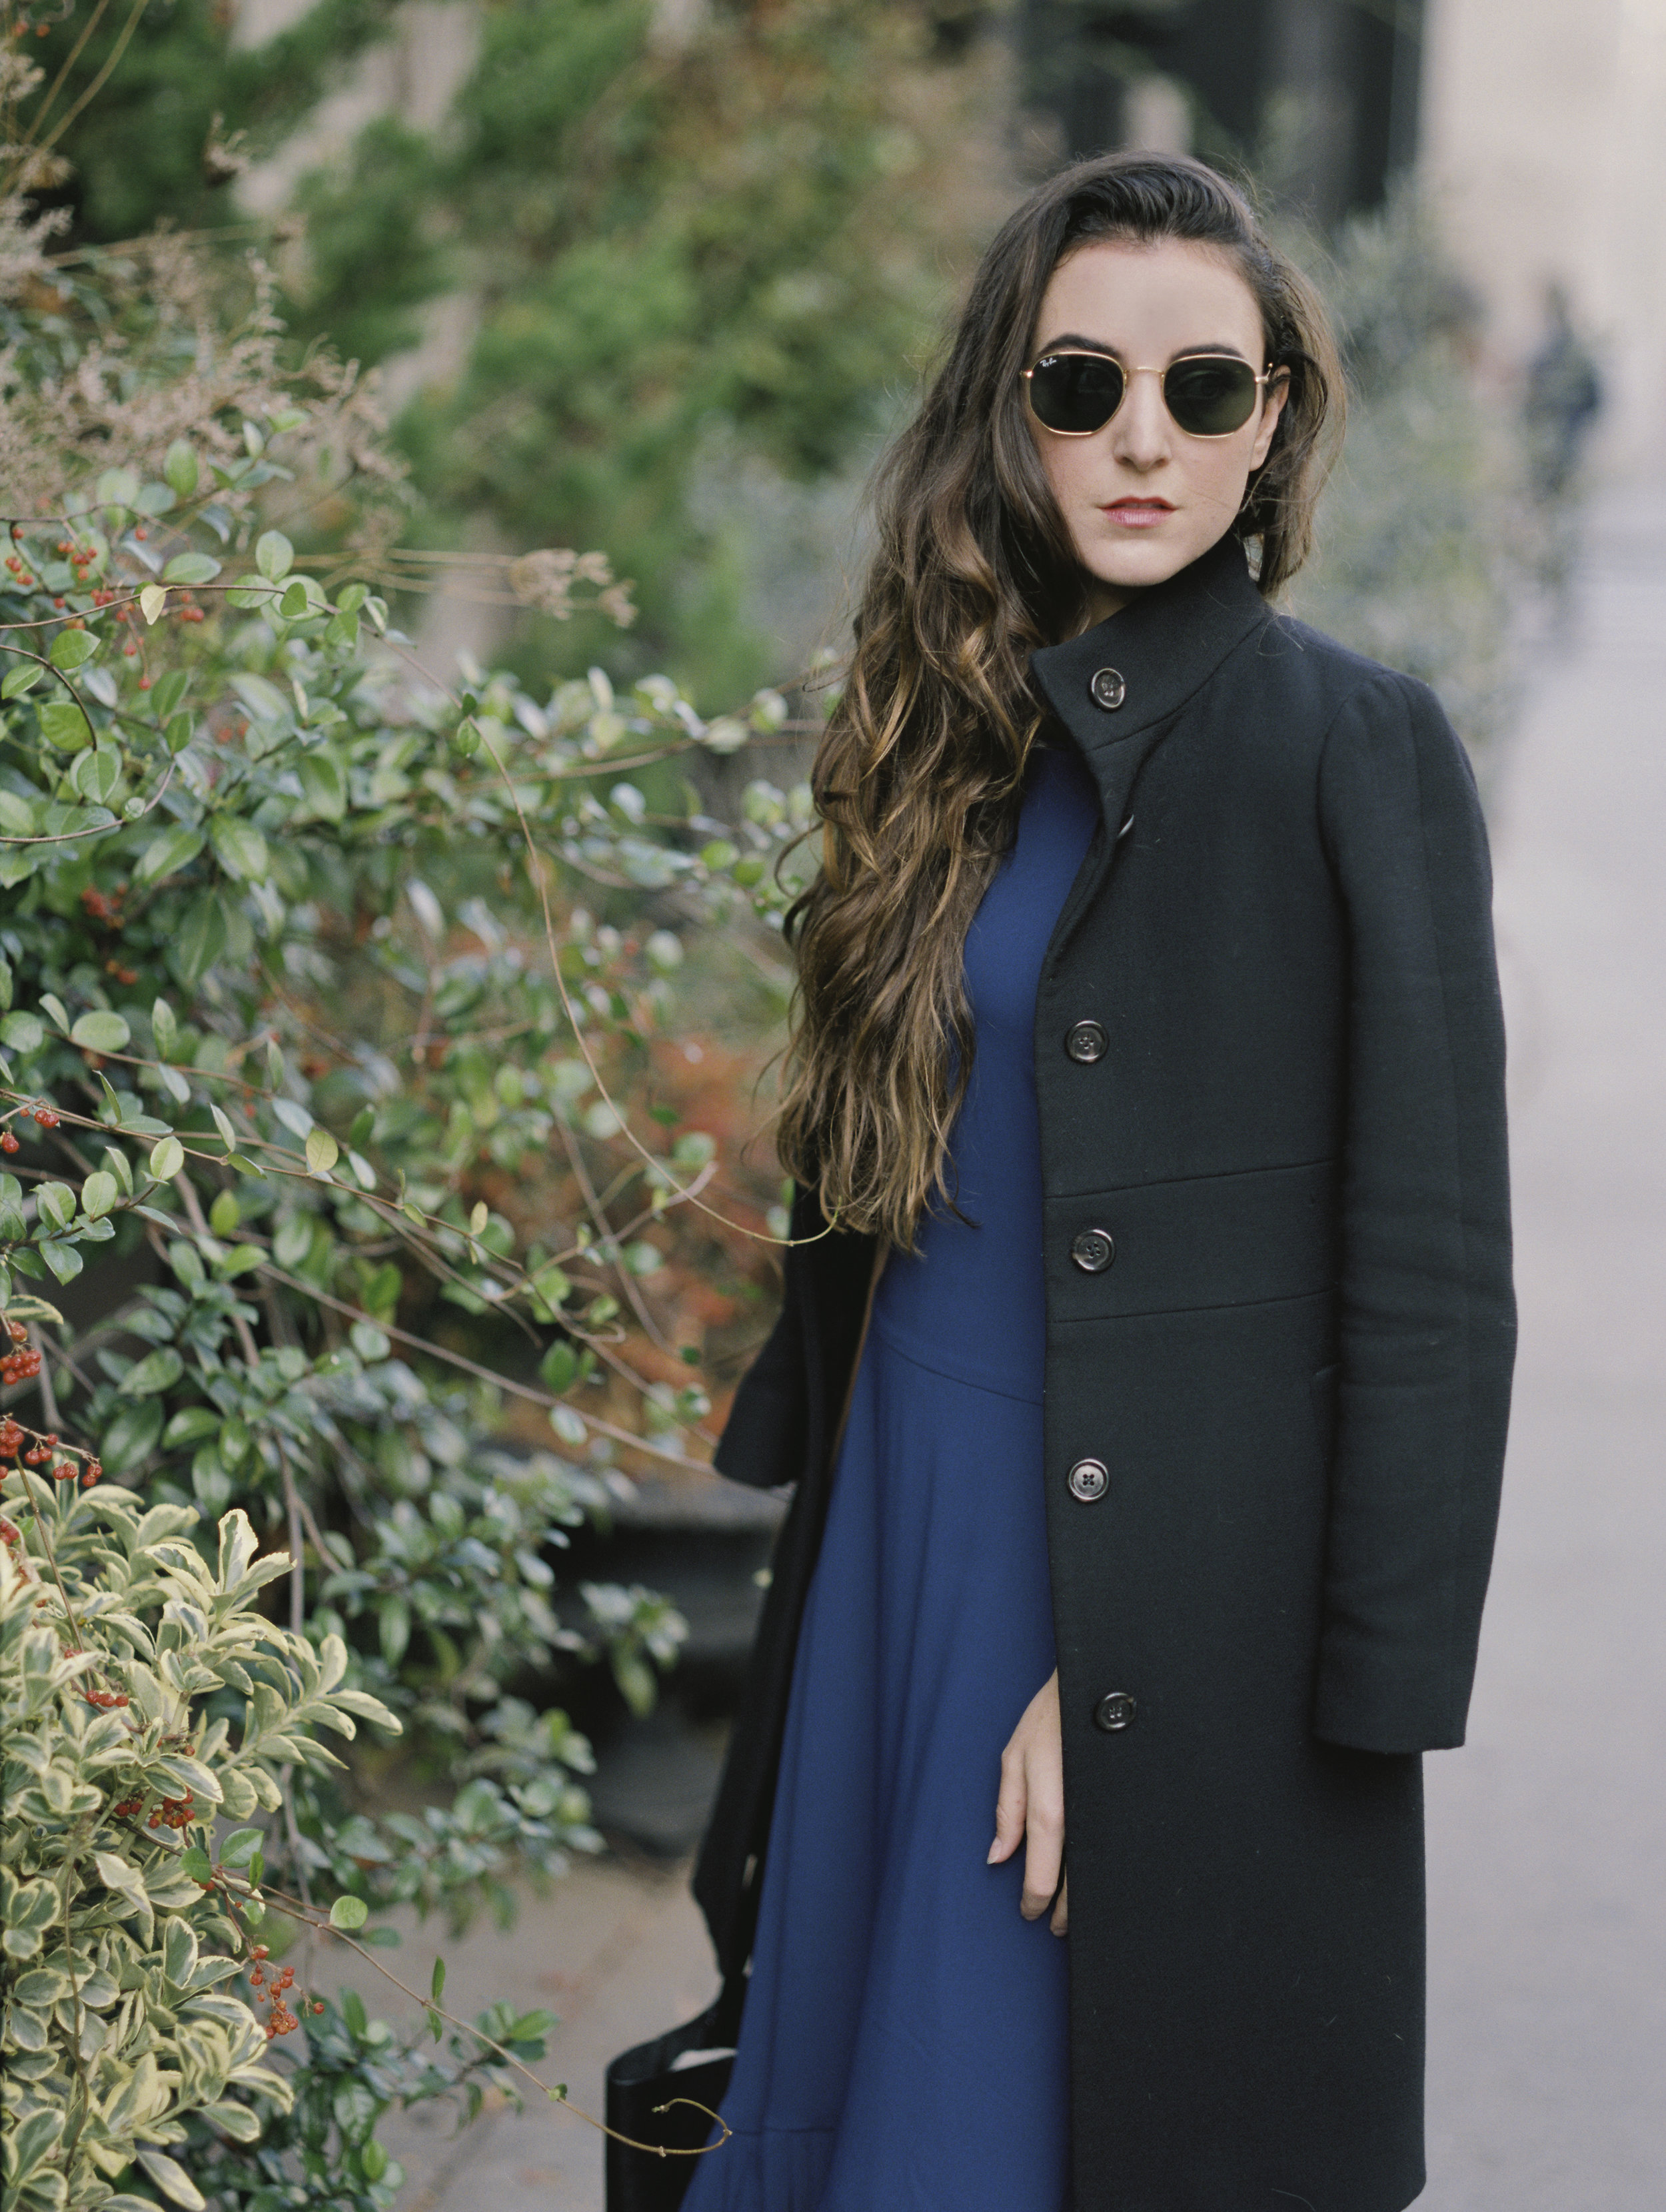 NYC Blue Dress7.jpg